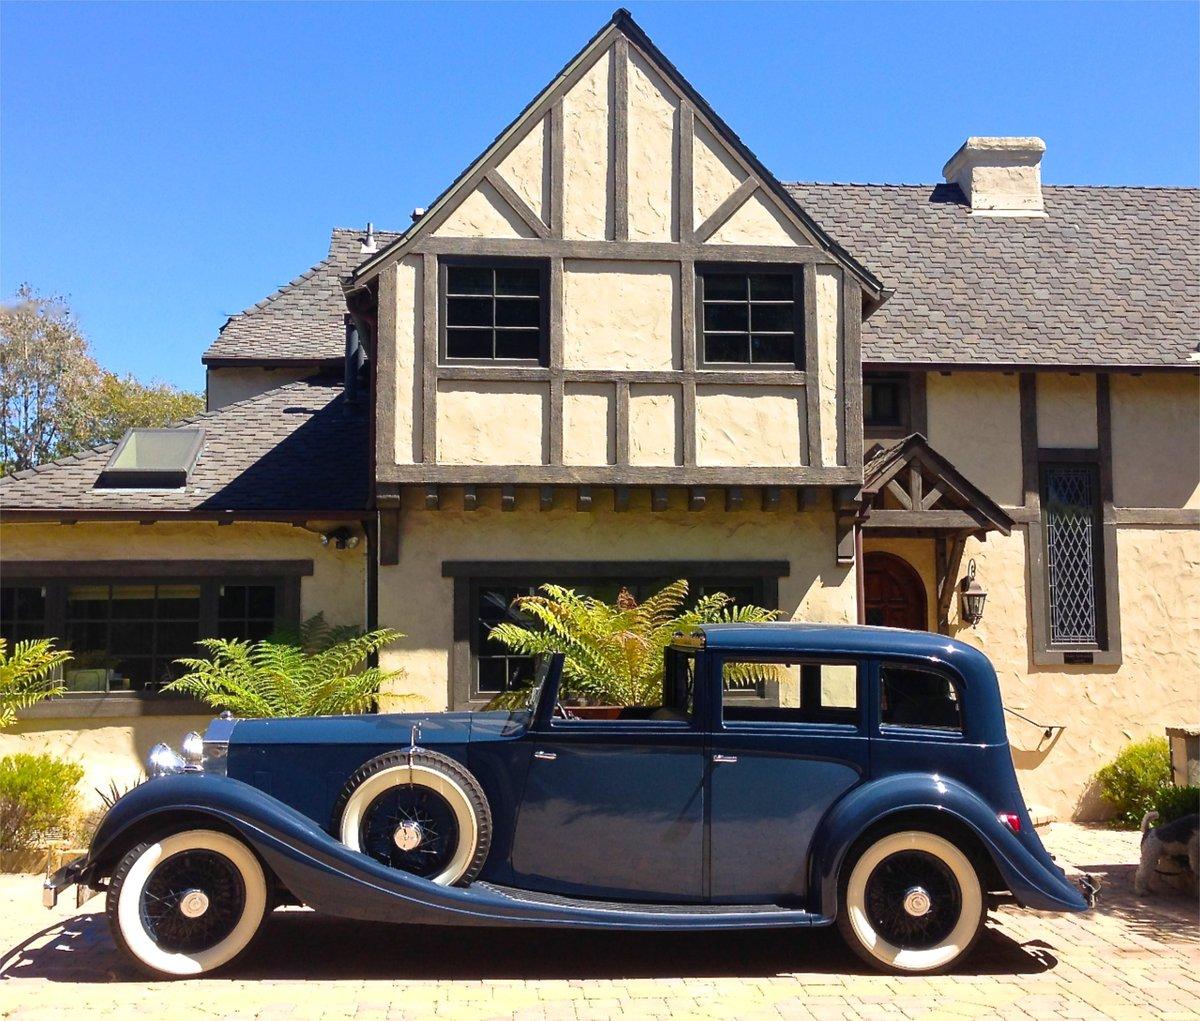 1934 Ex/Gracie Fields/Duke Of Buccleuch Rolls Royce For